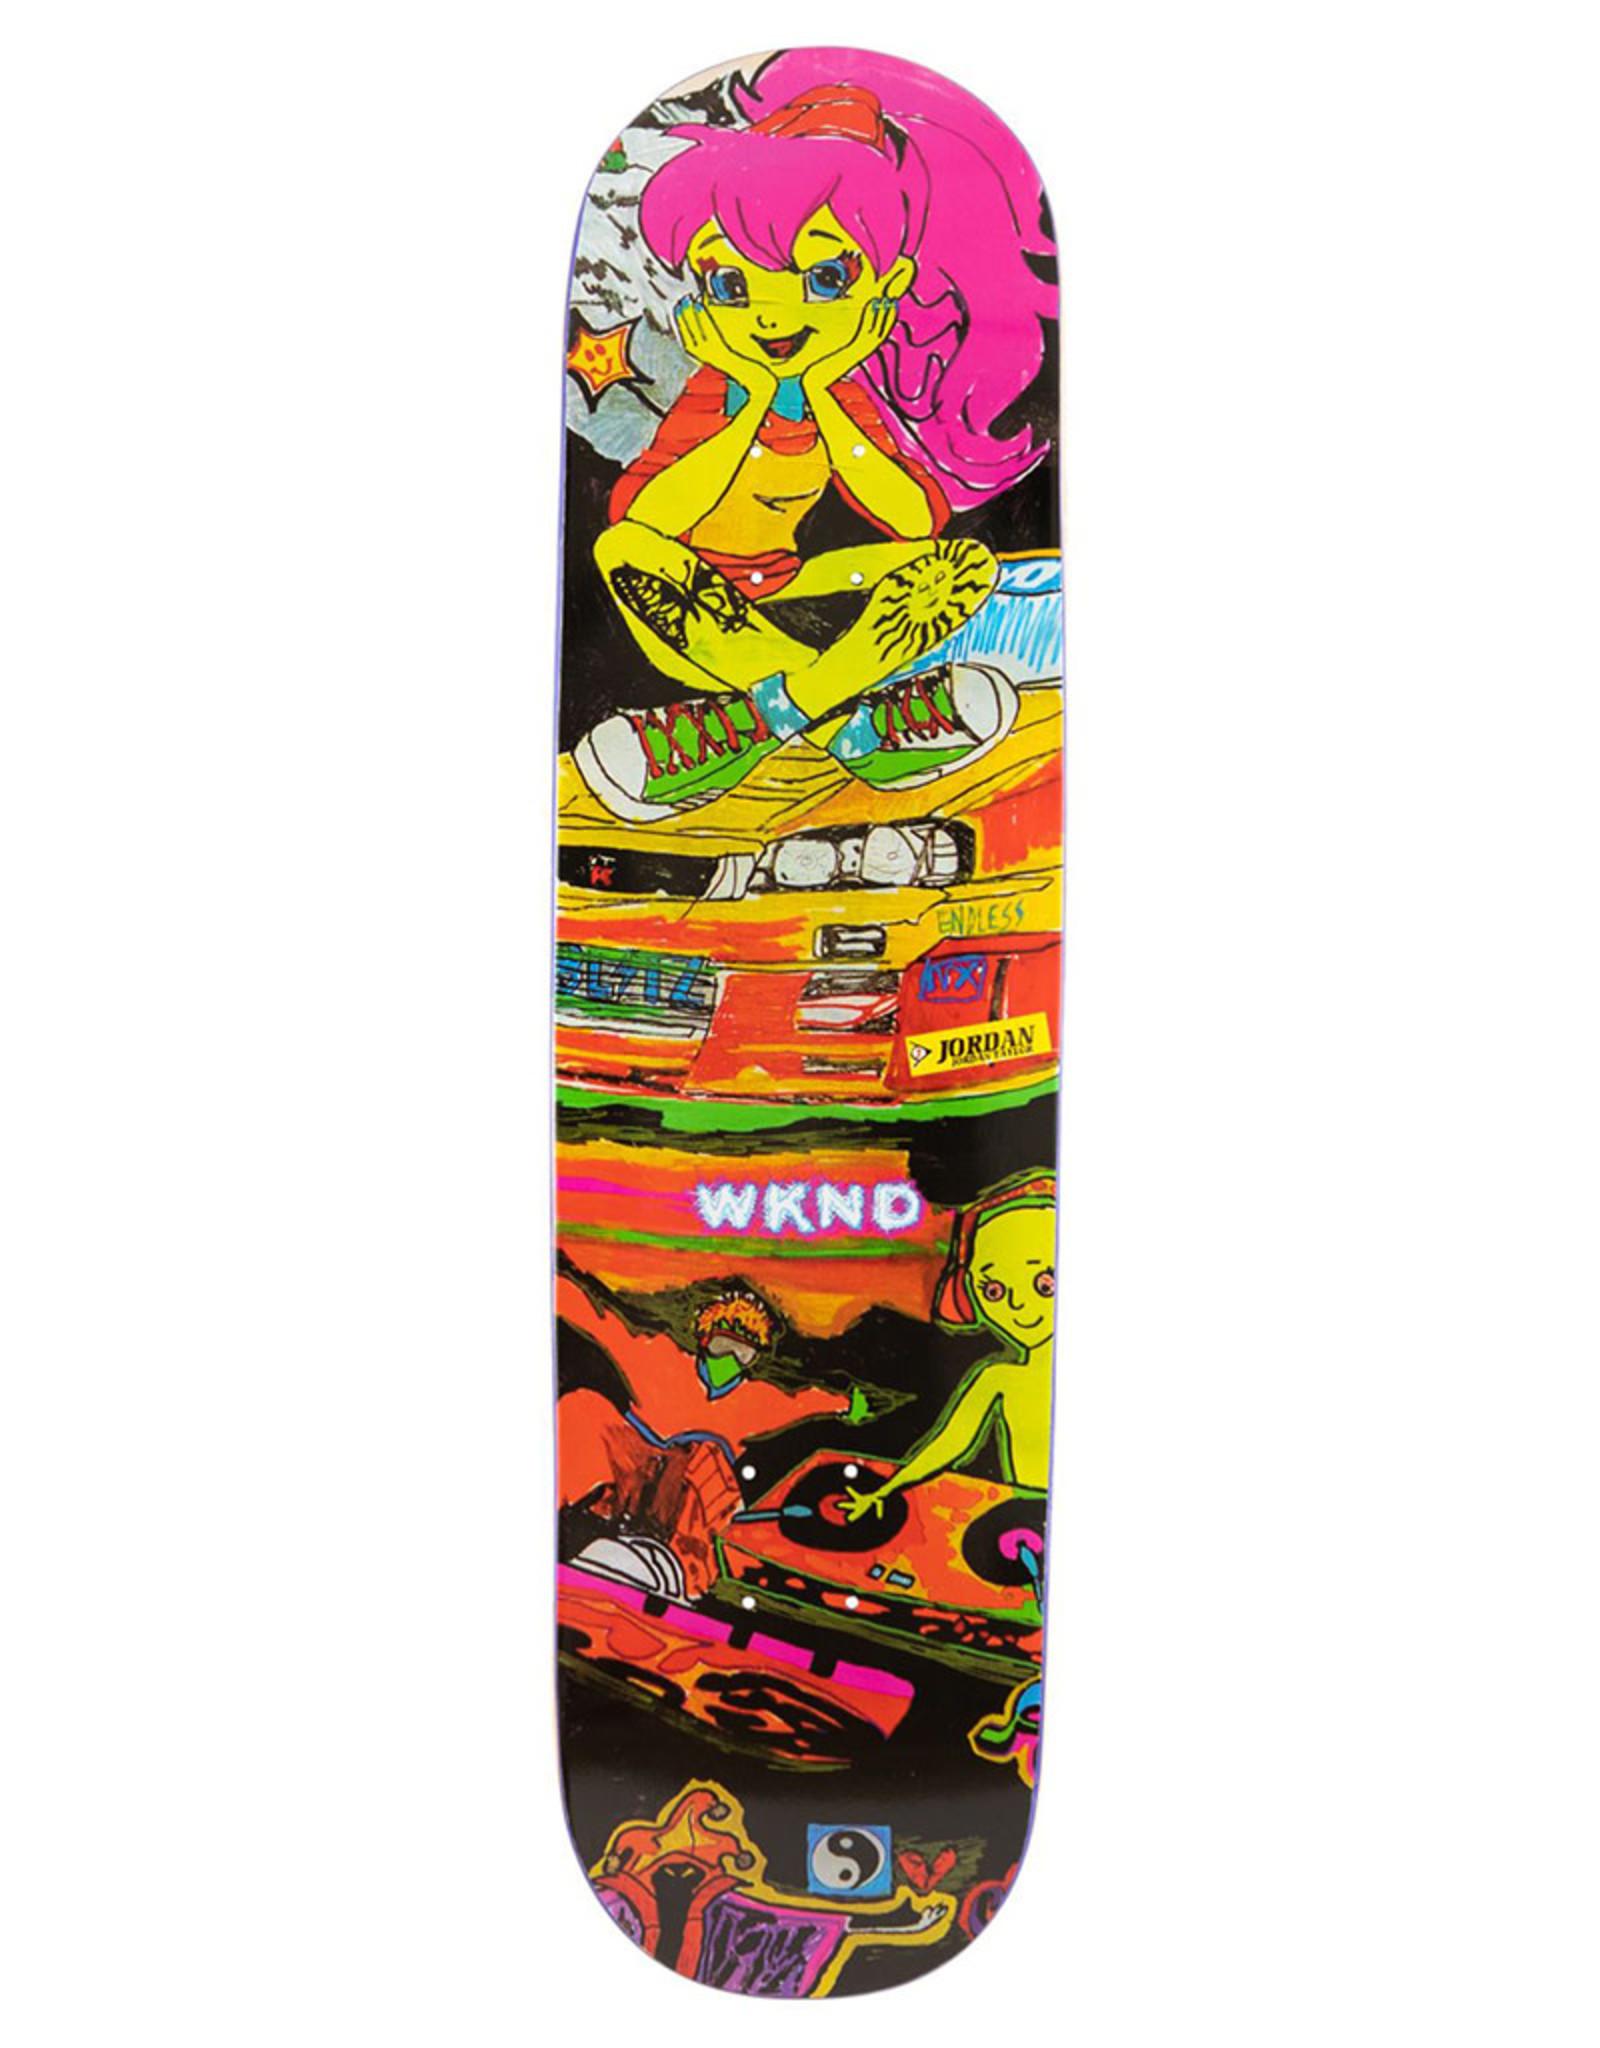 Wknd Skateboards Wknd Deck Jordan Taylor Sympathy Dropout (8.125)